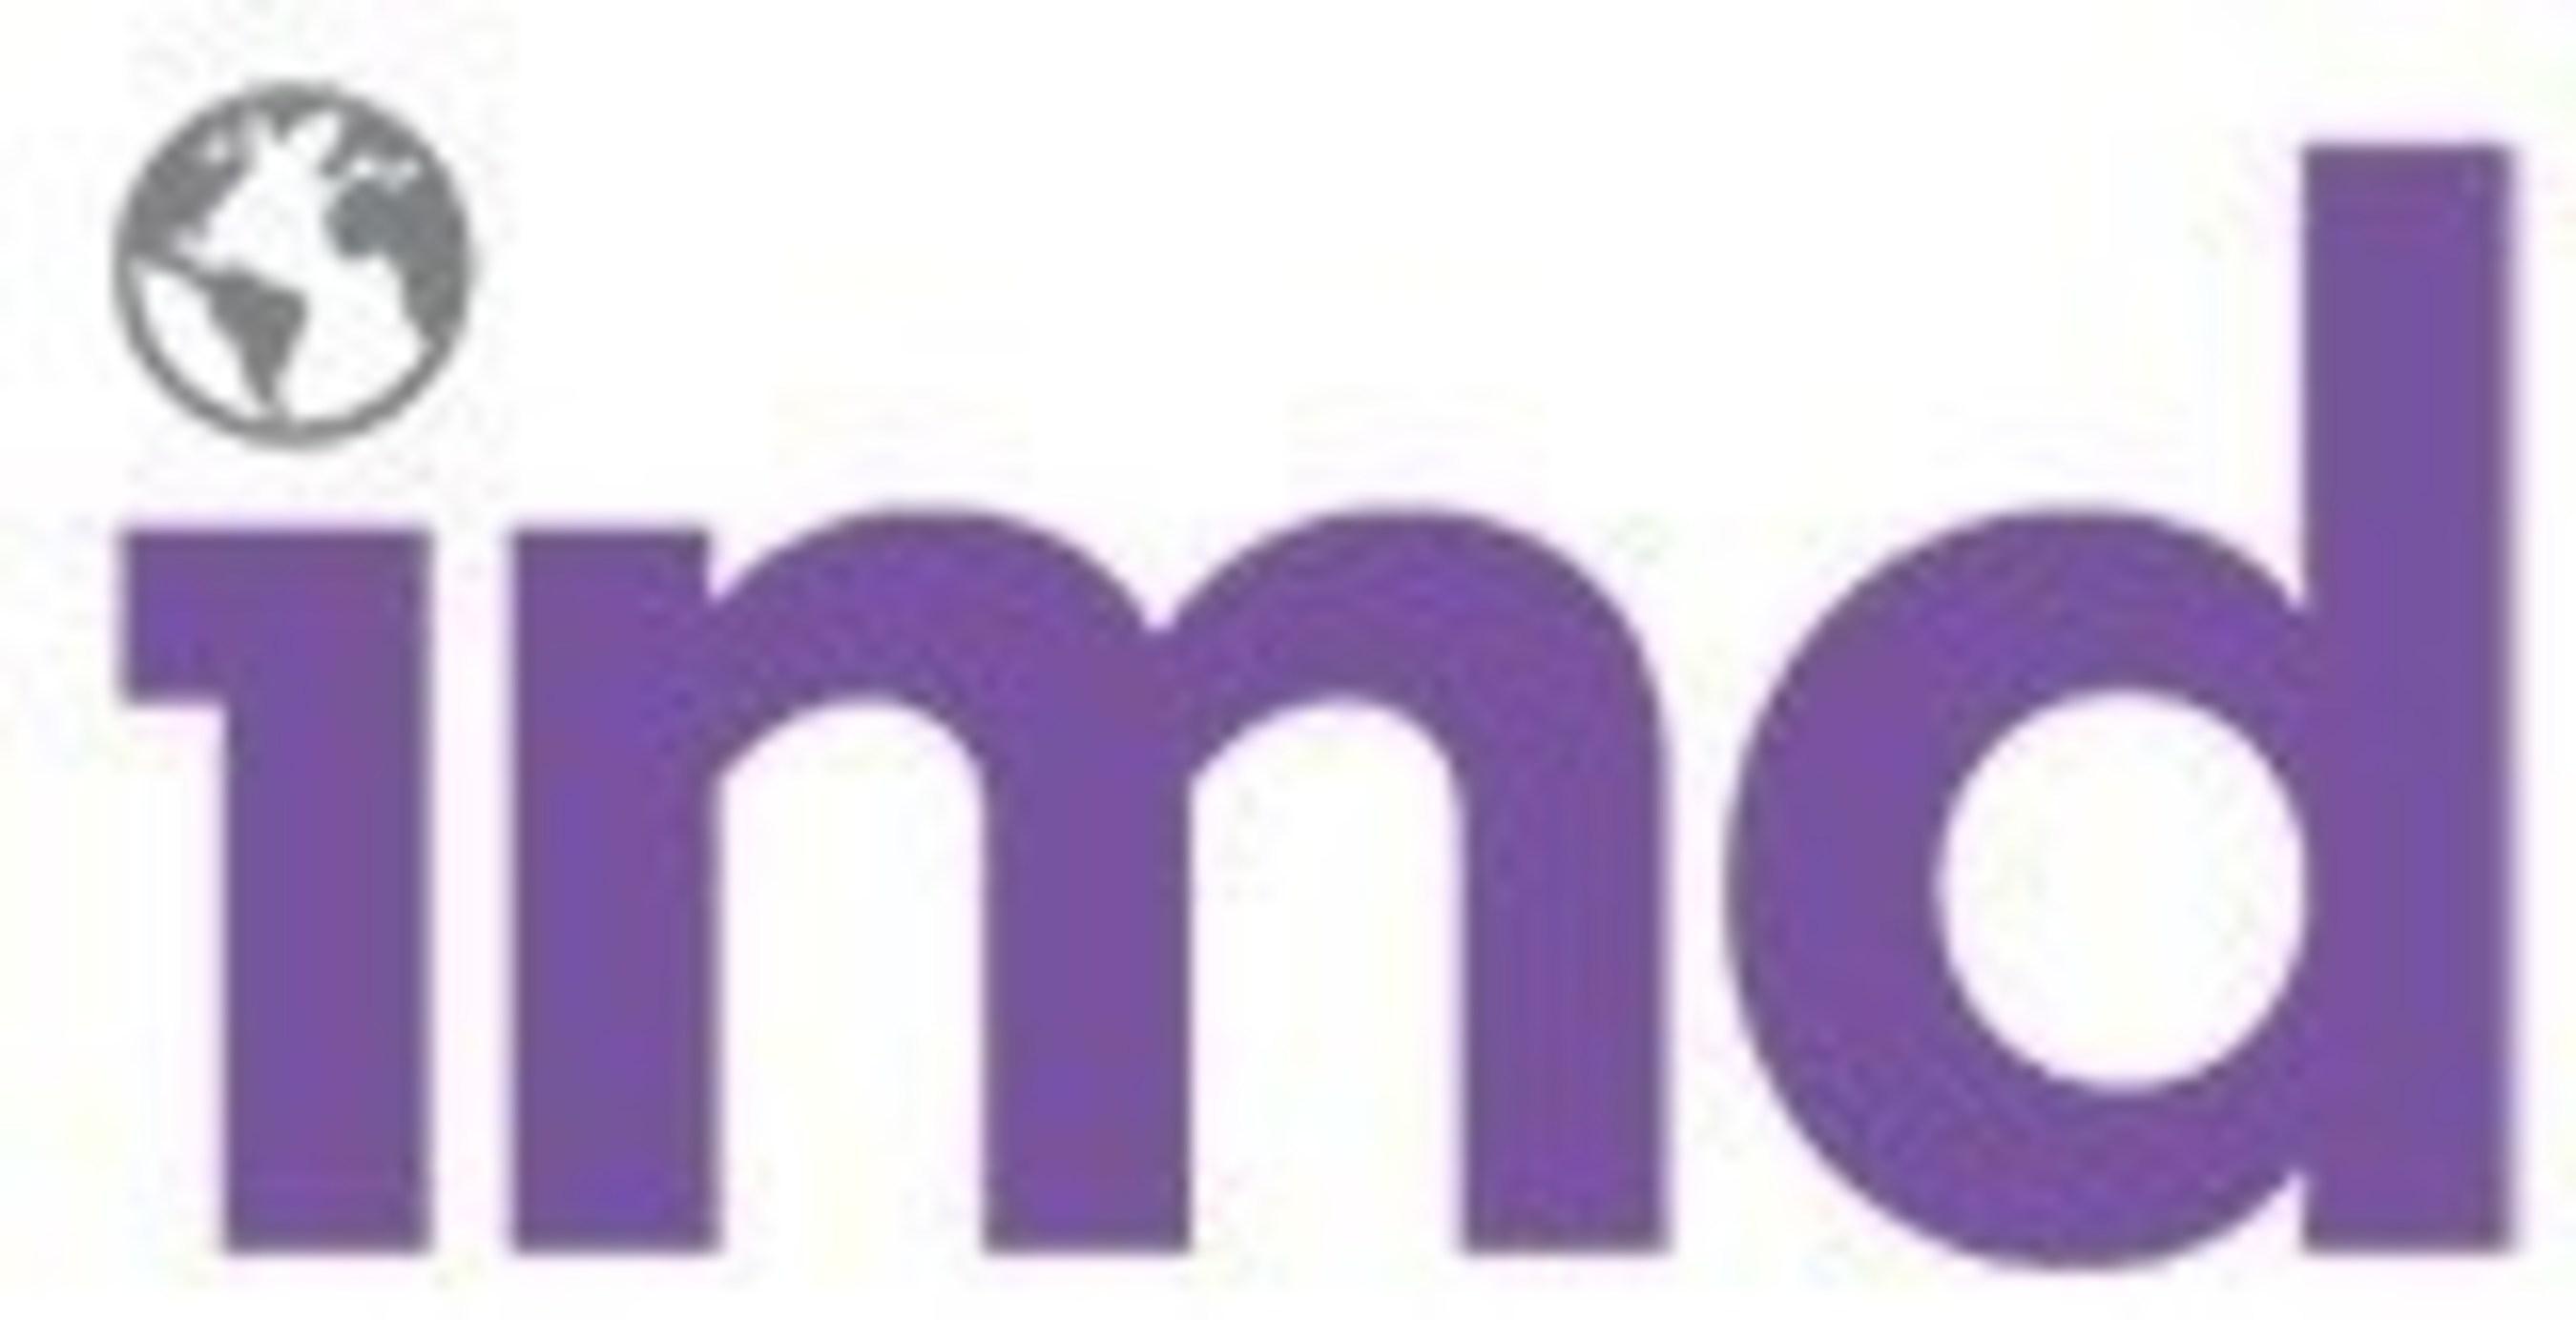 xfinity on demand movies list